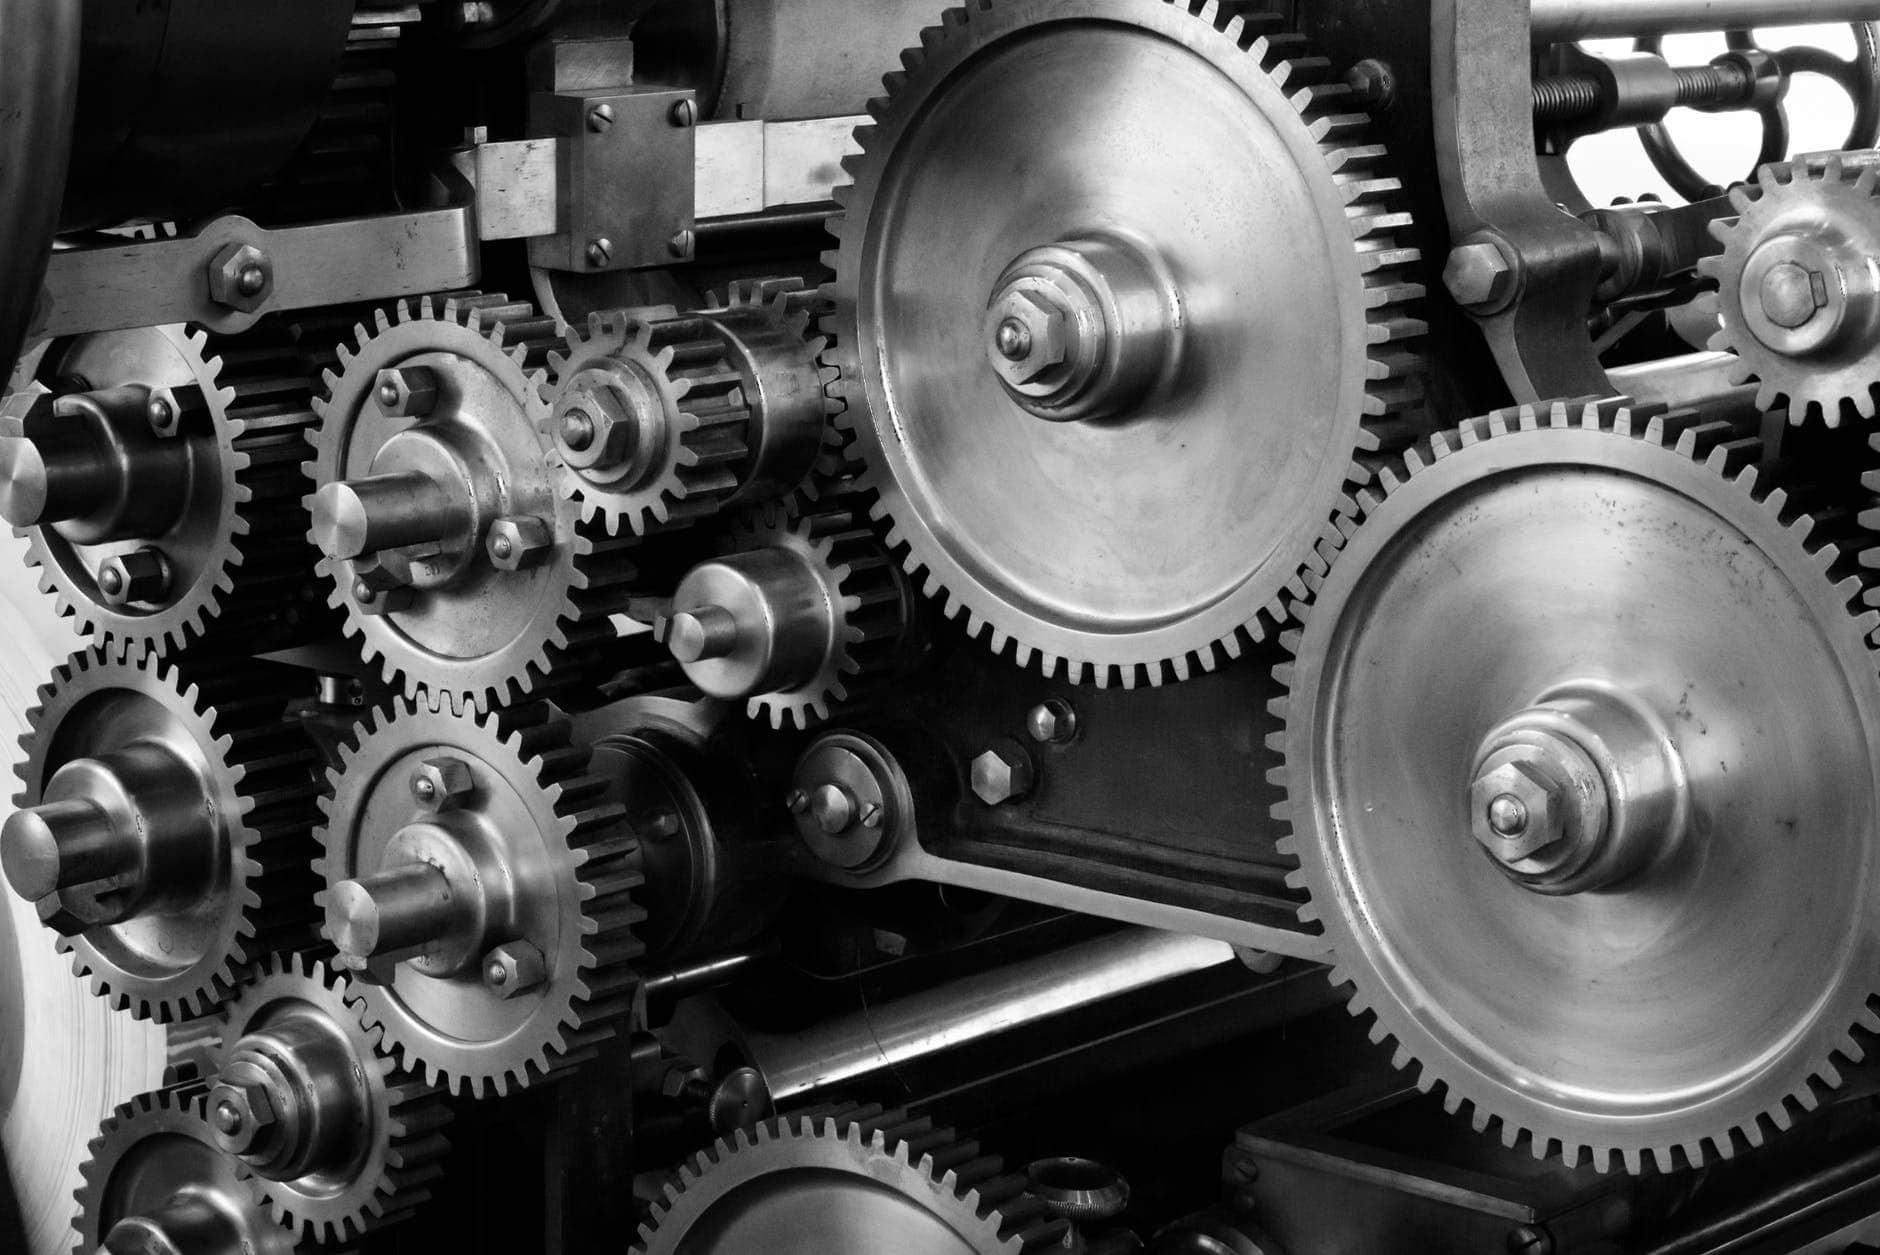 gears-cogs-machine-machinery